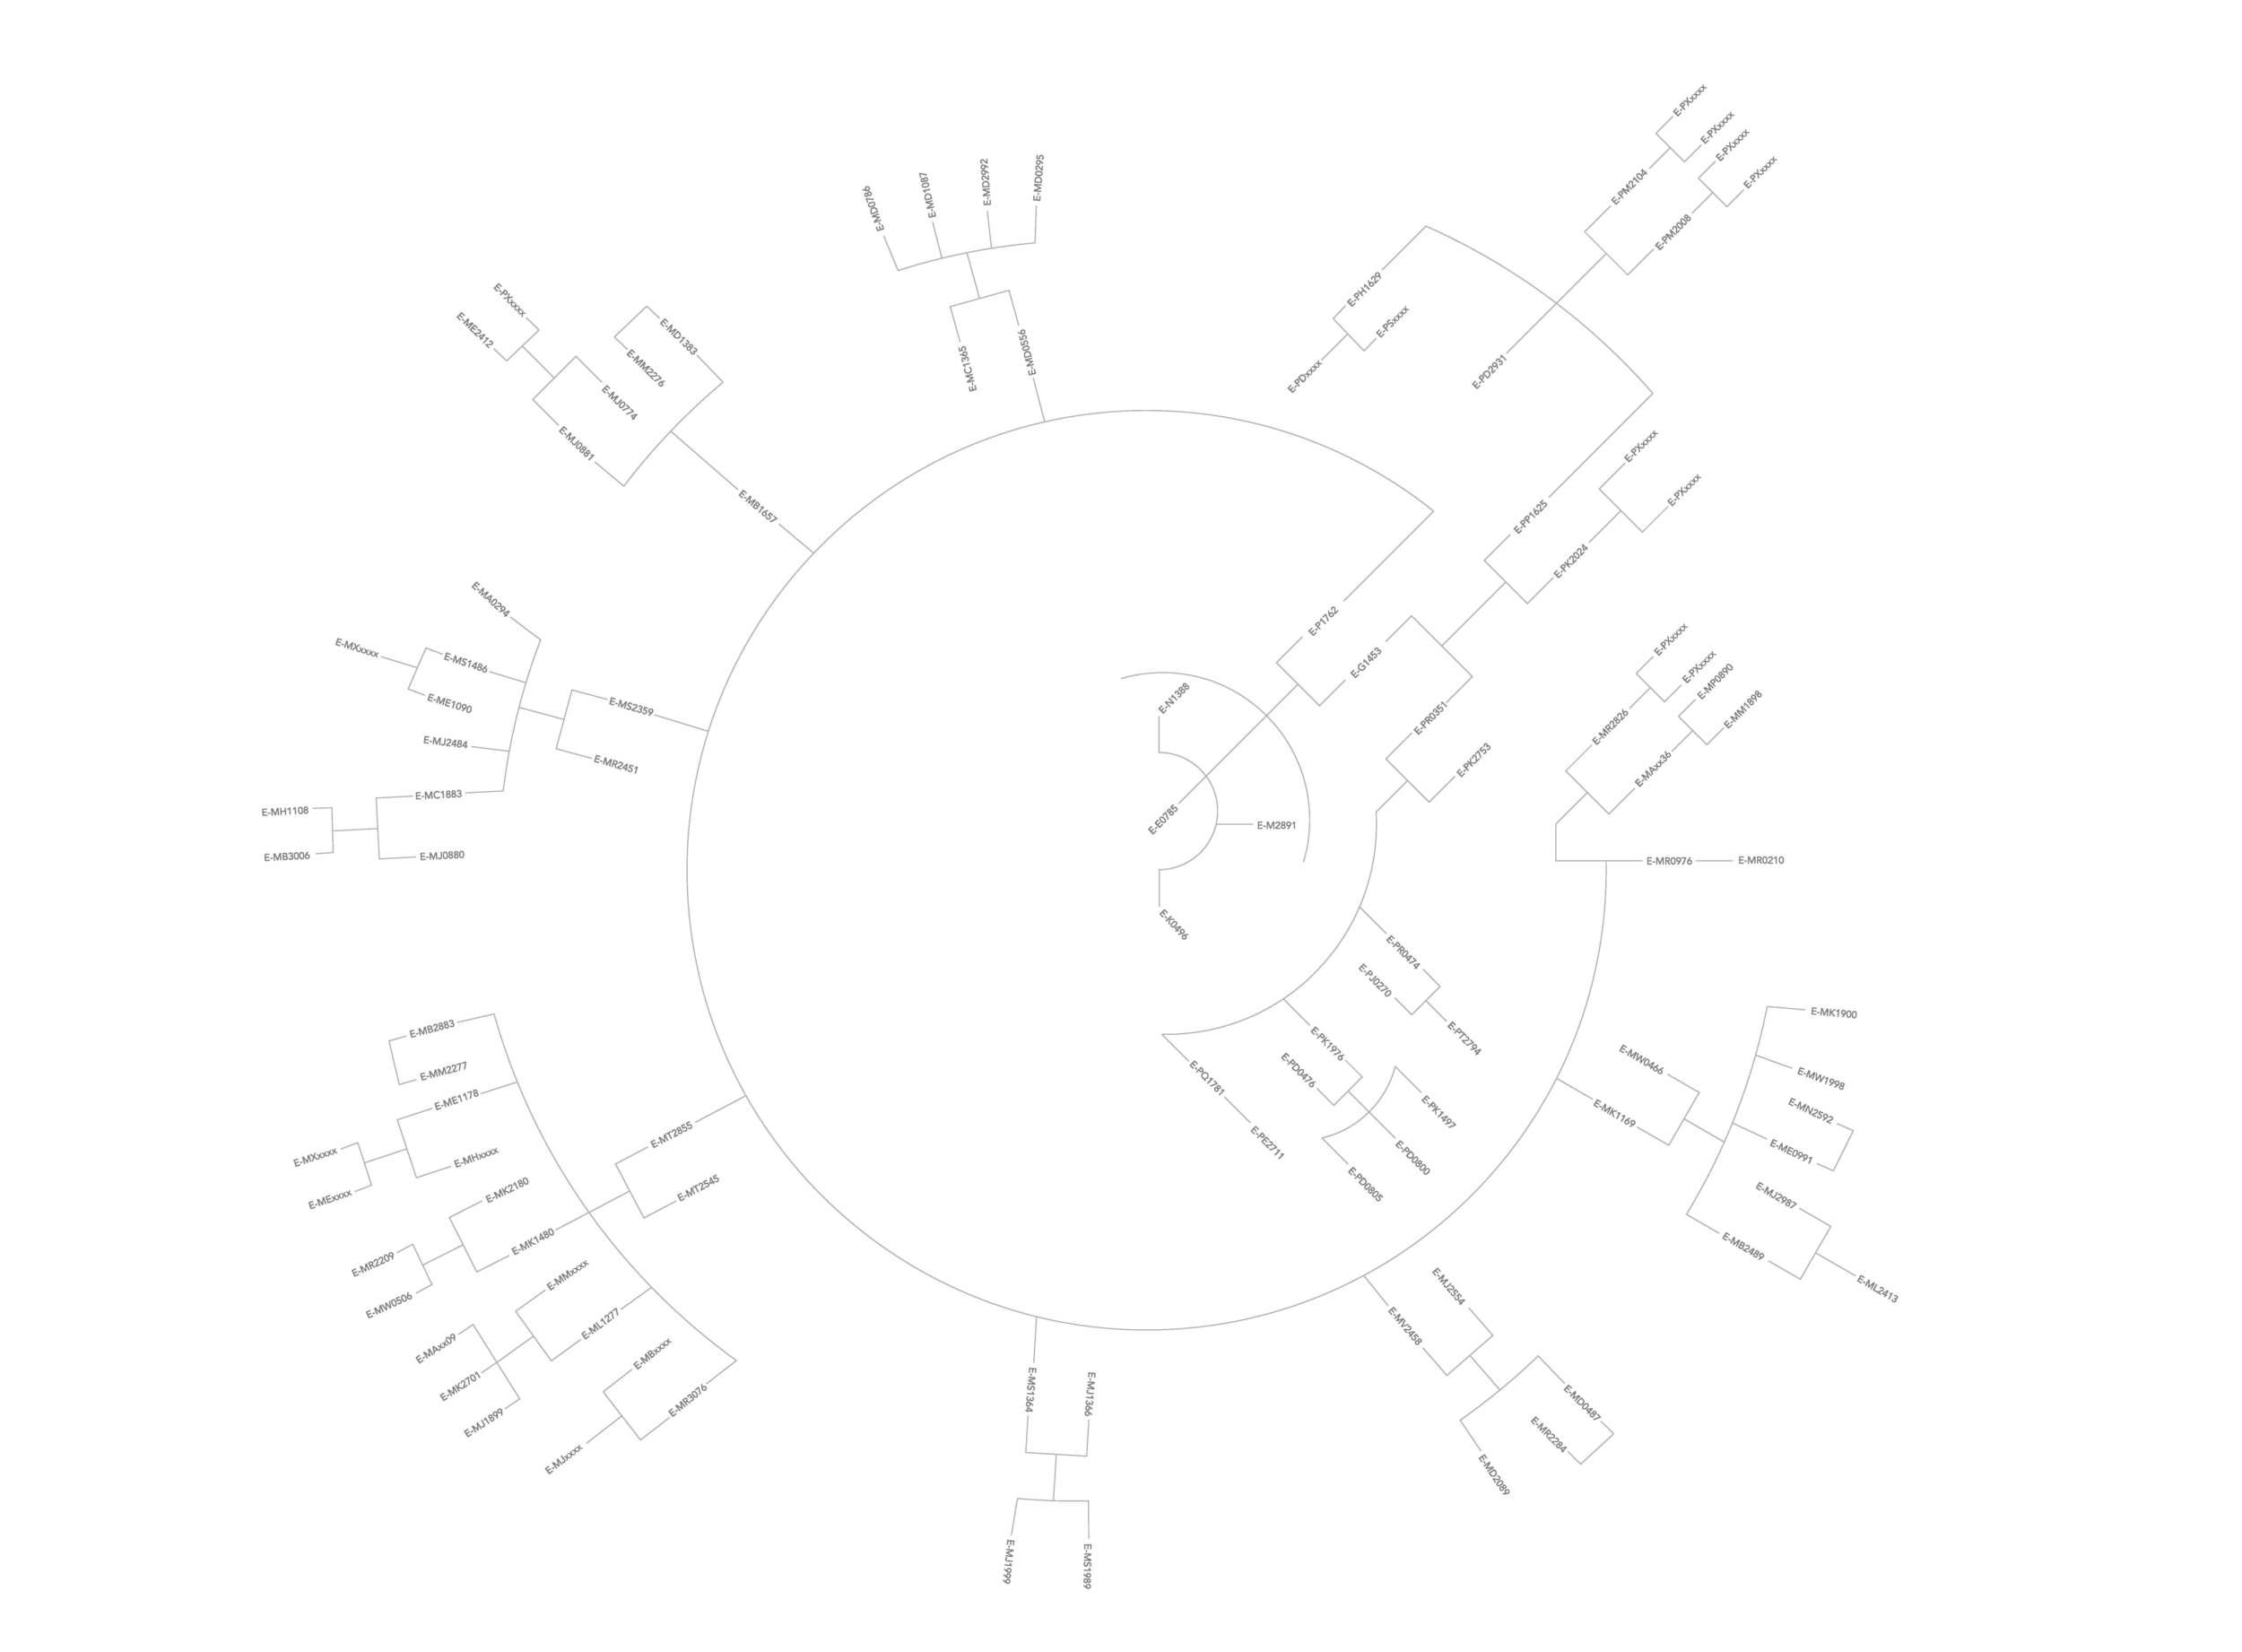 ACosmicLineage_Outlines.jpg